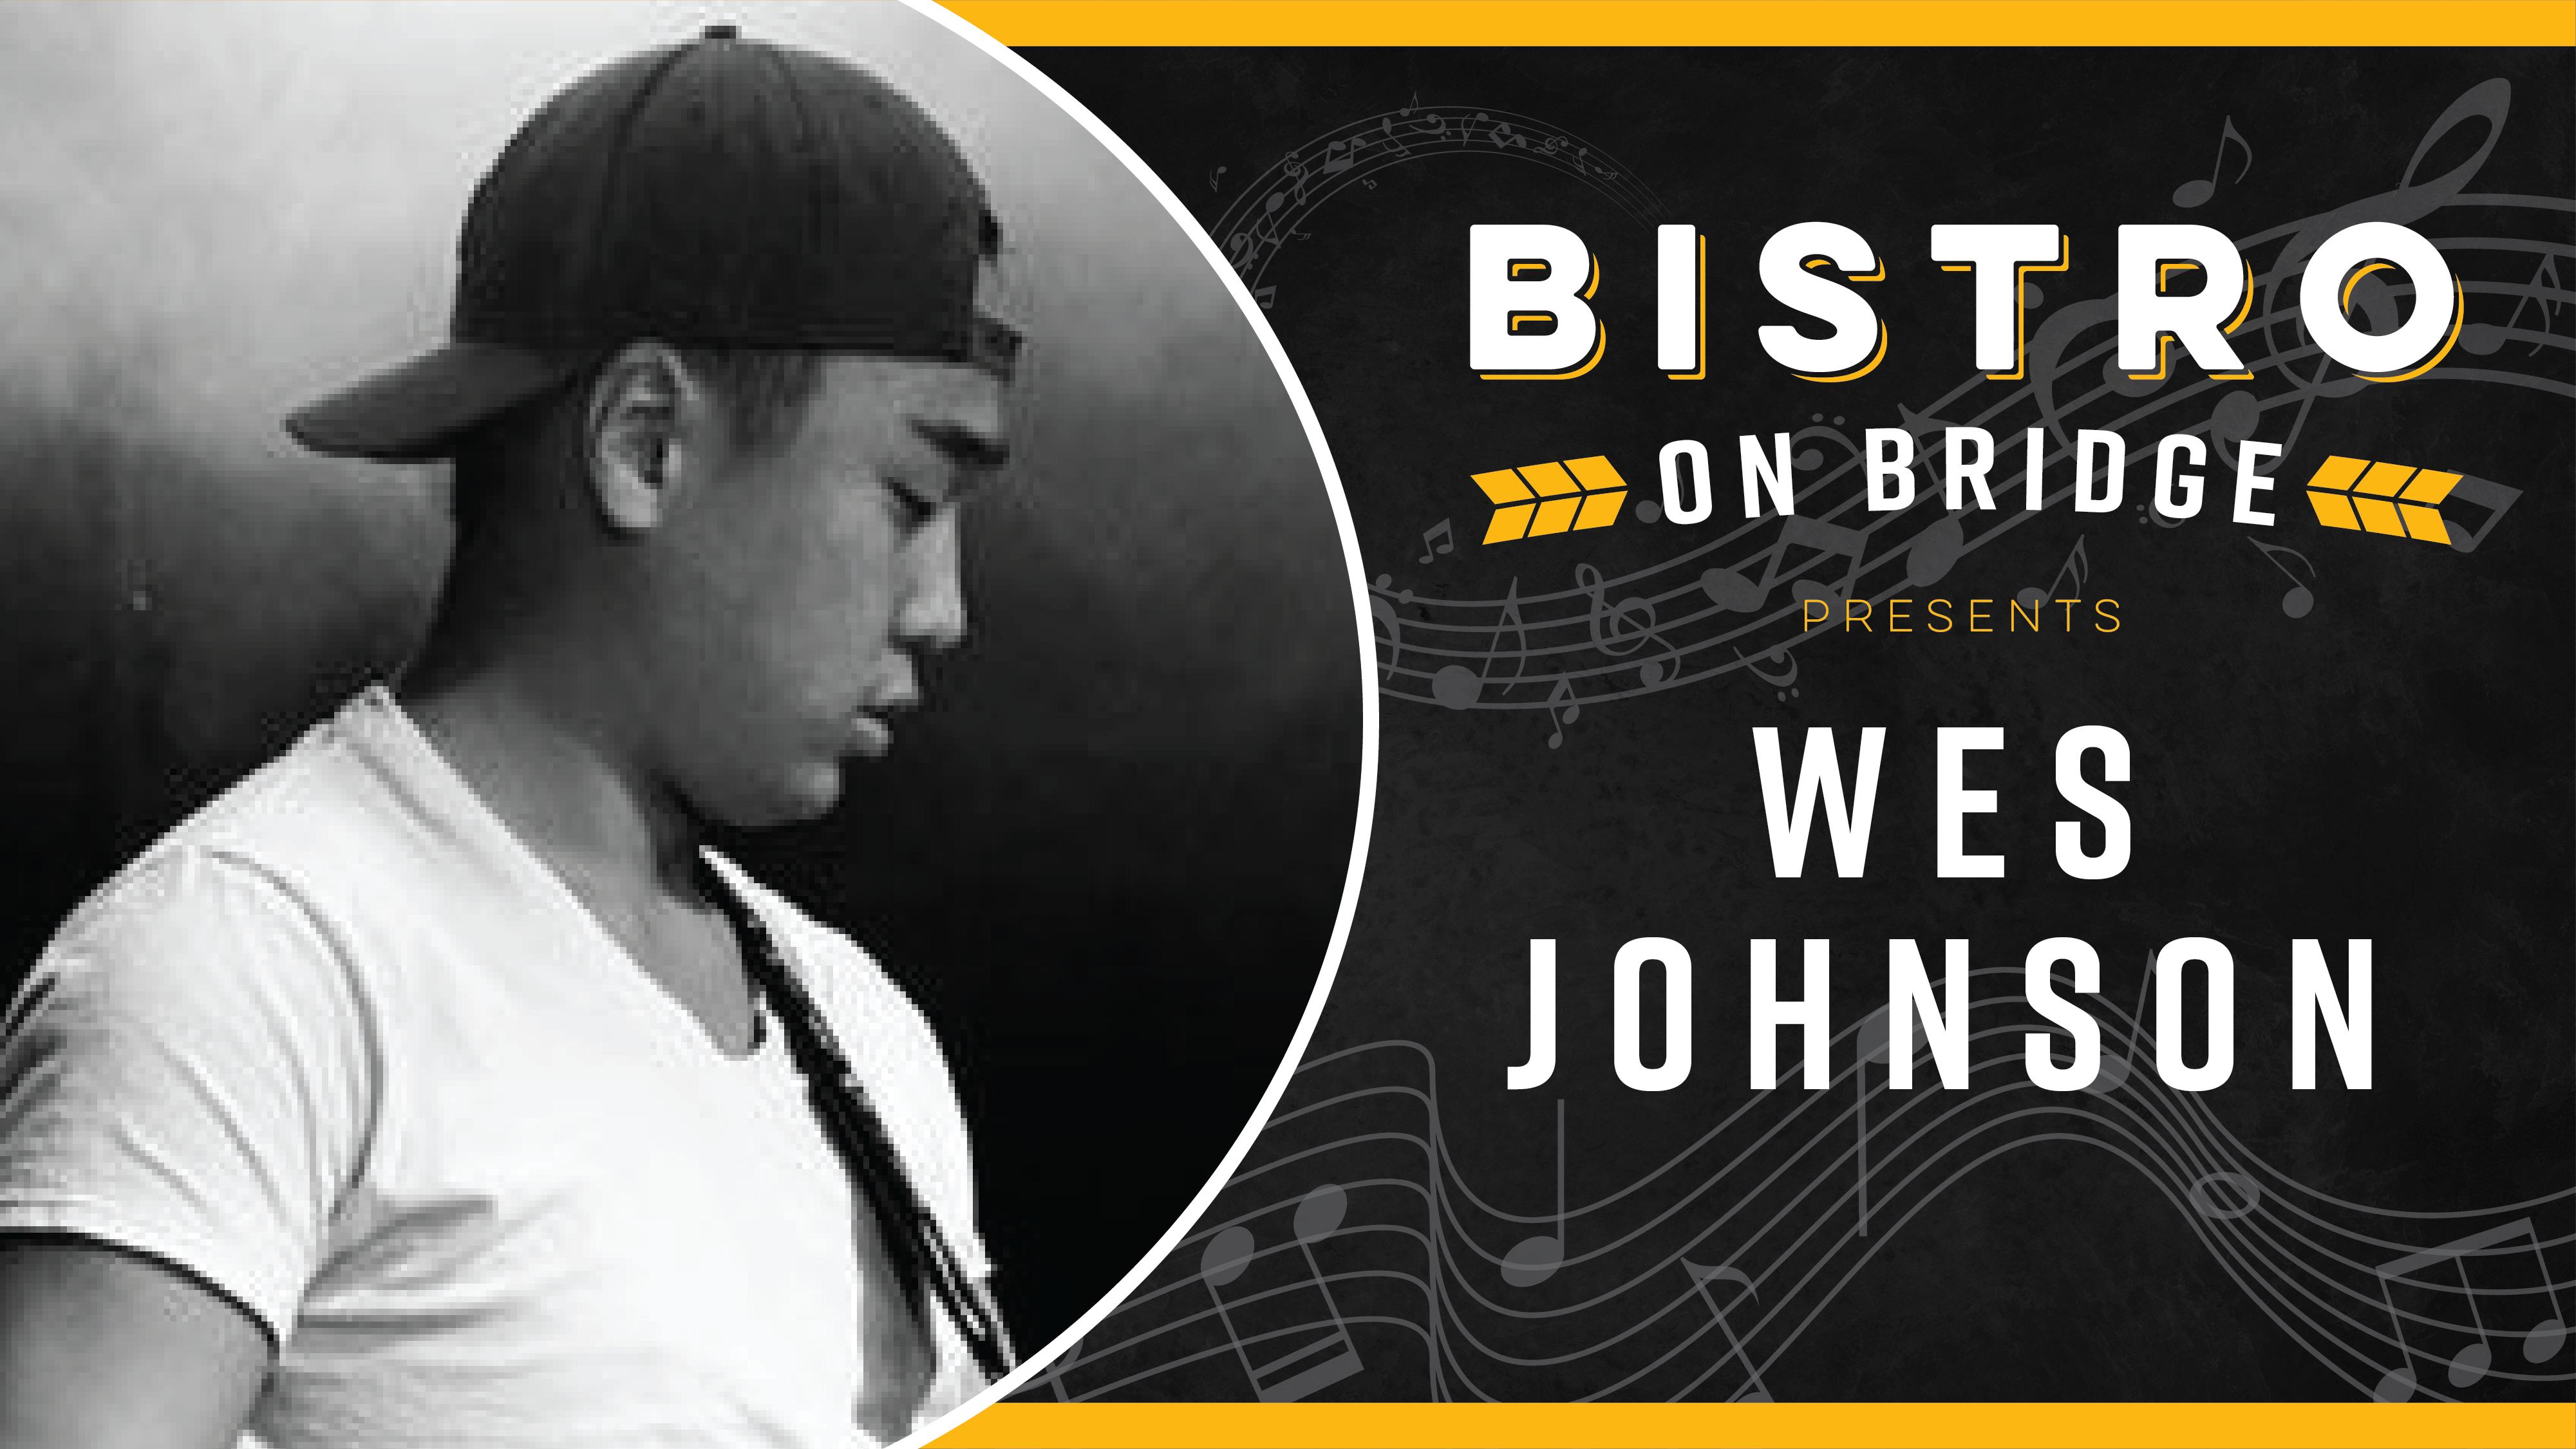 Wes Johnson - Bistro